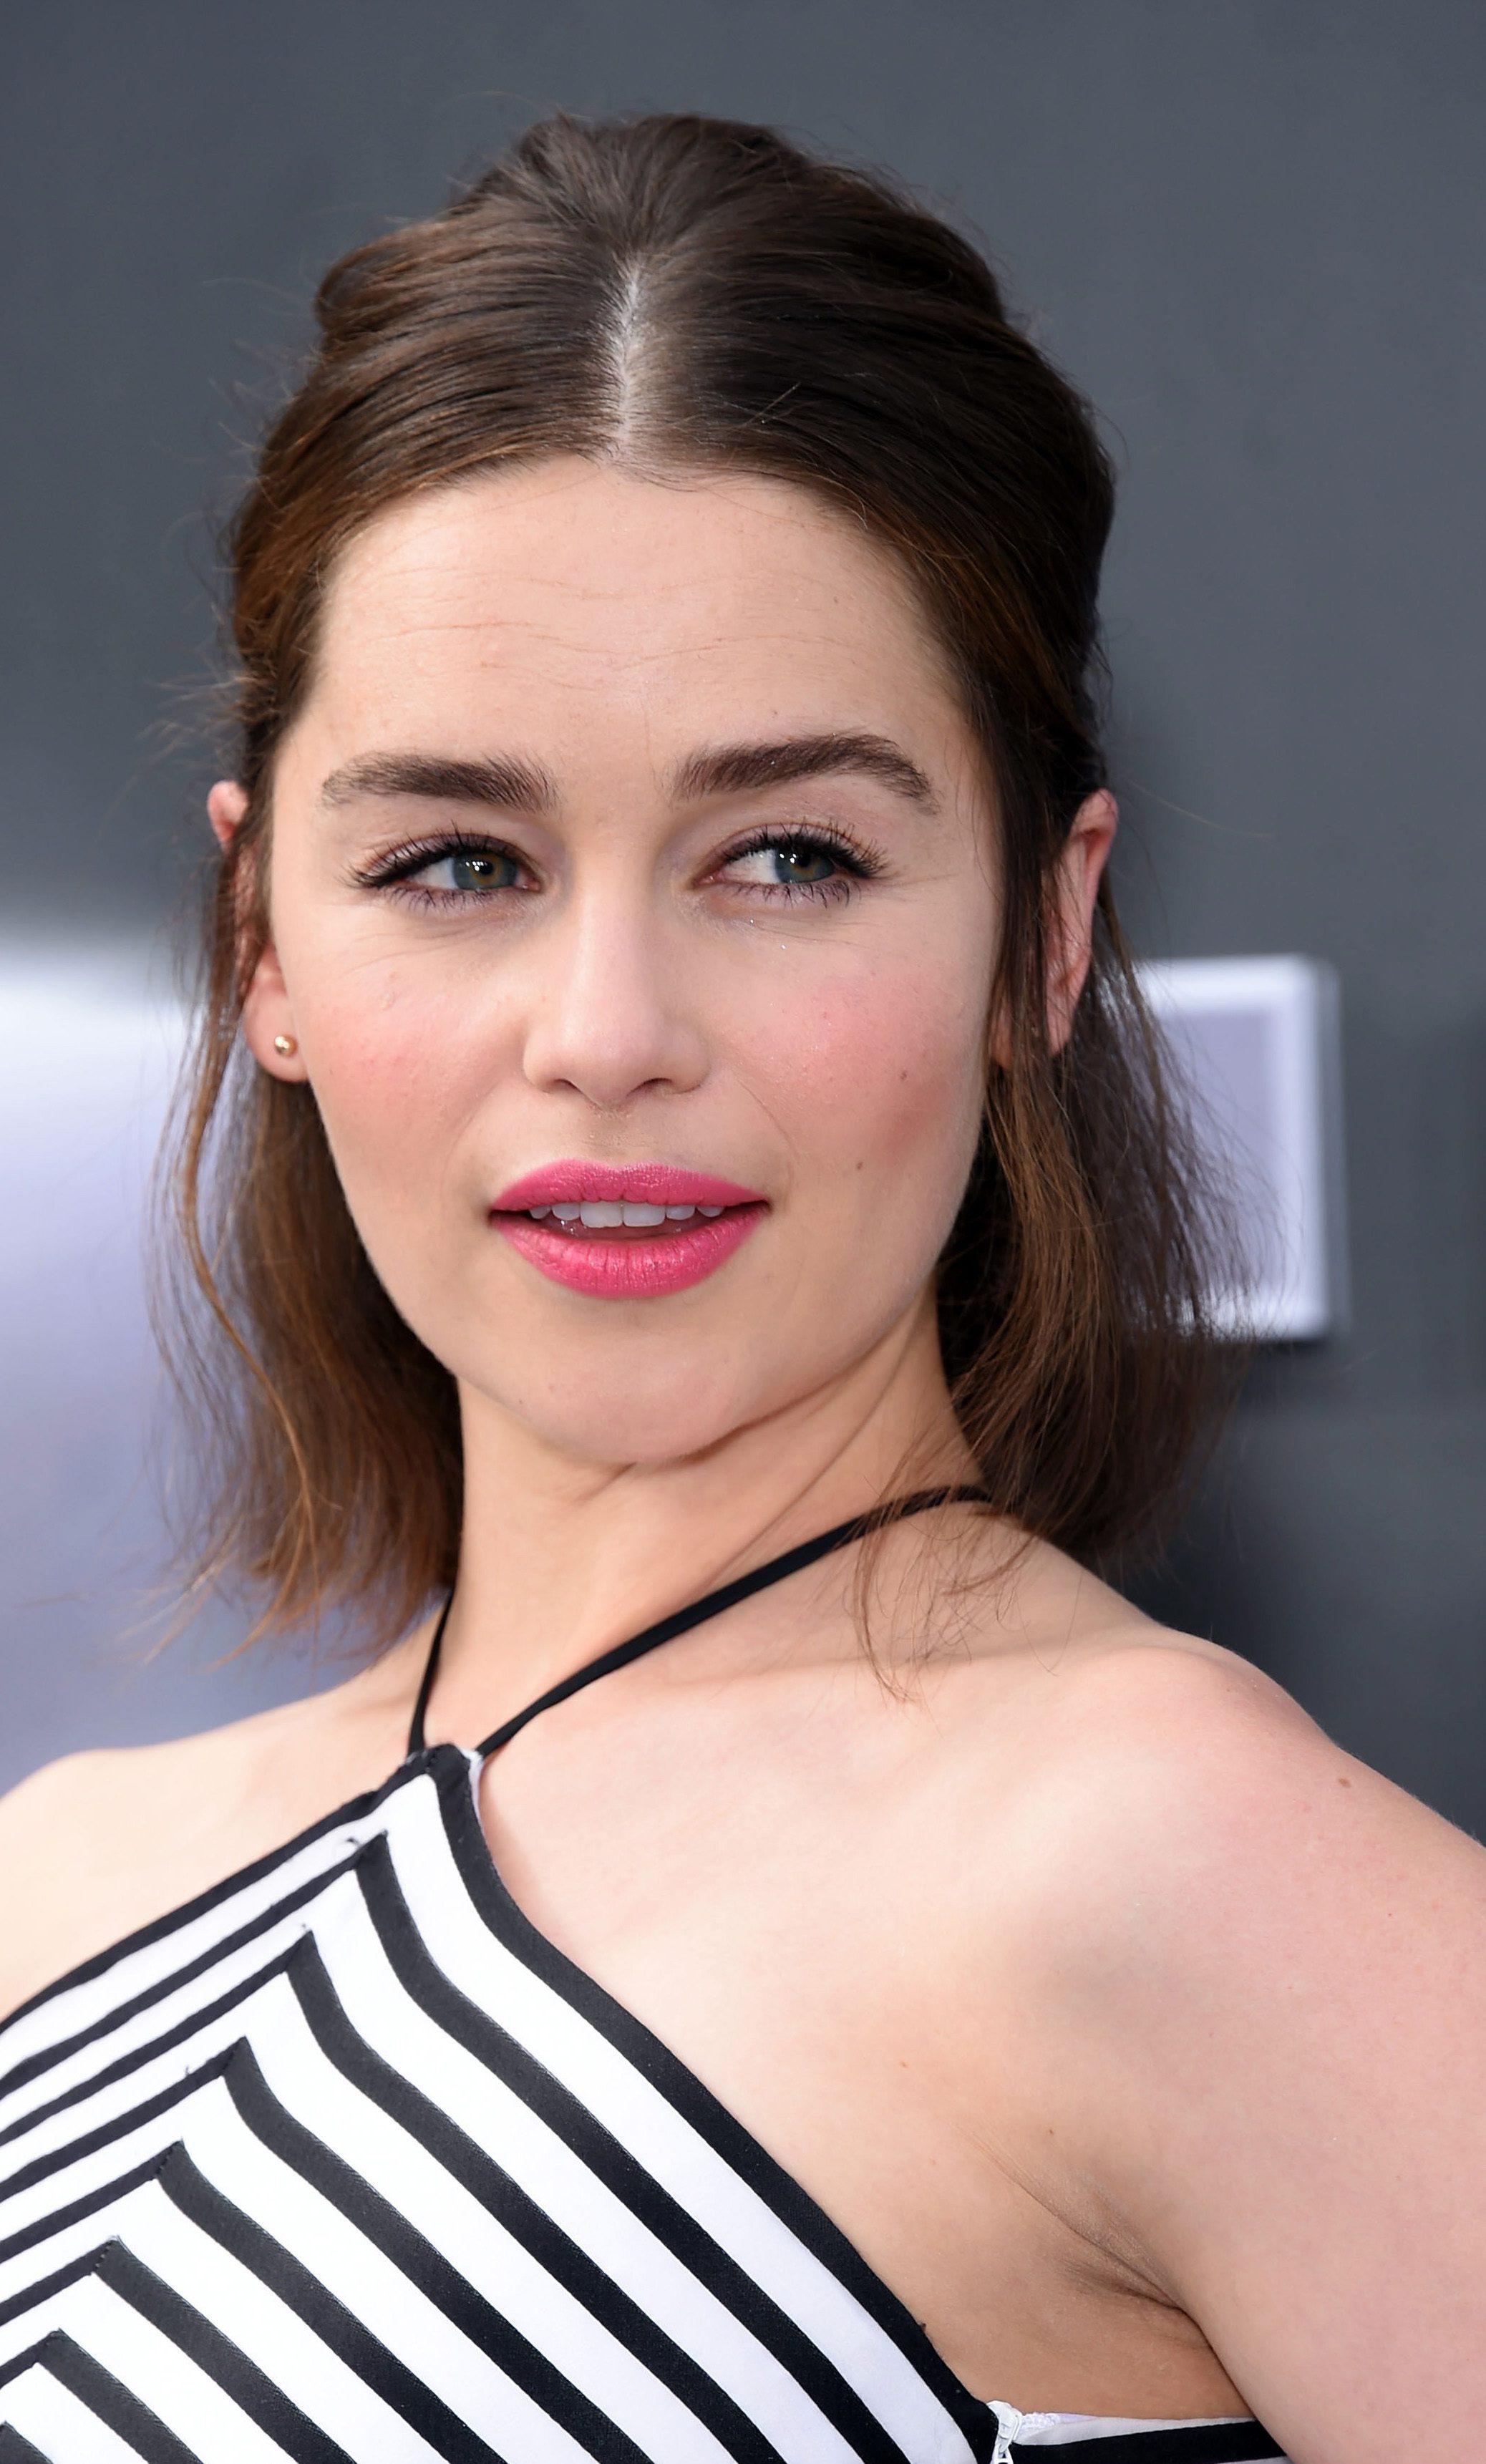 Emilia Clarke's Mid Part Half-Up